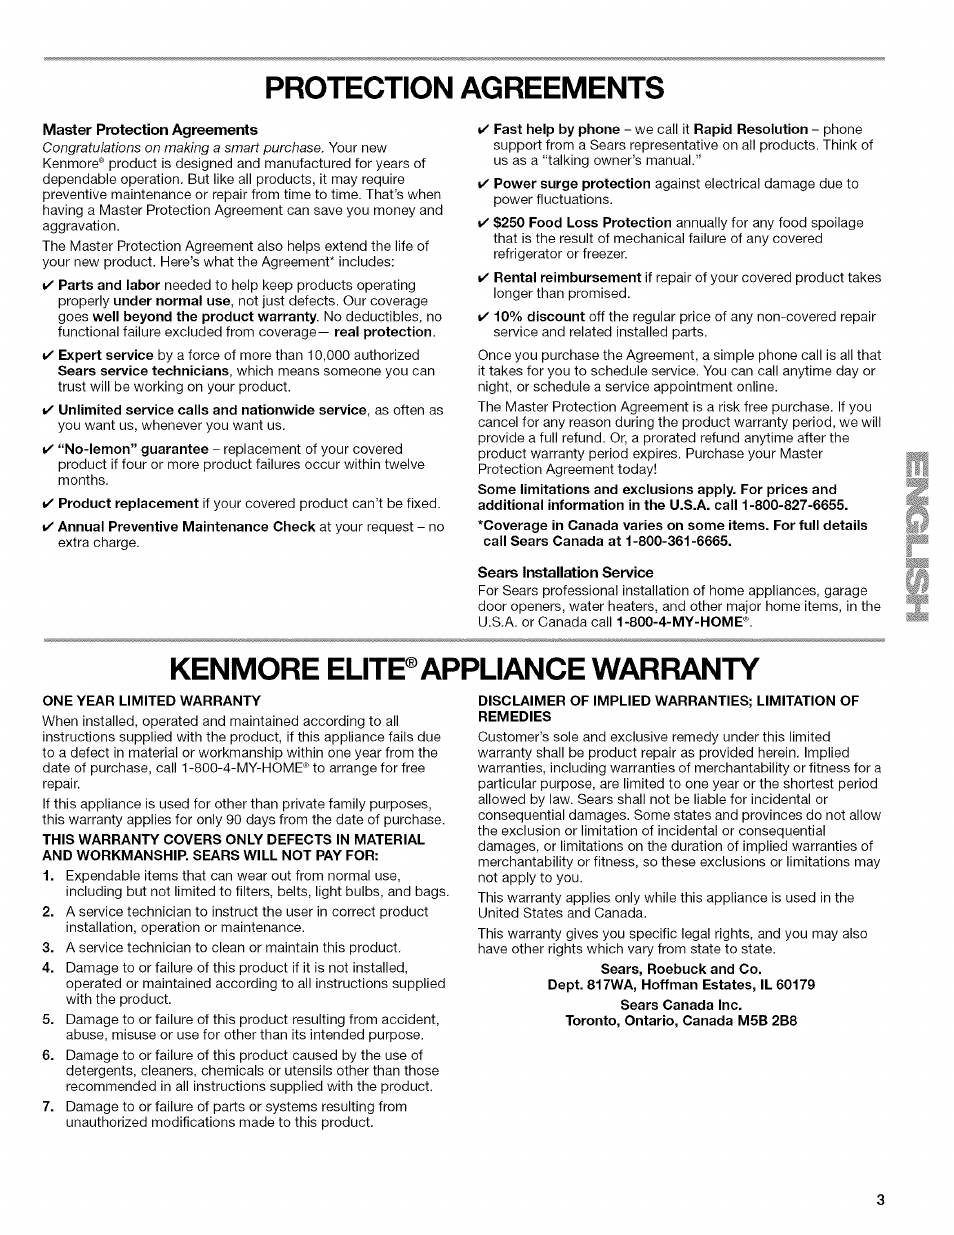 master pratection agreements sears installation service protection rh manualsdir com Bosch Appliances LG Appliances Manuals